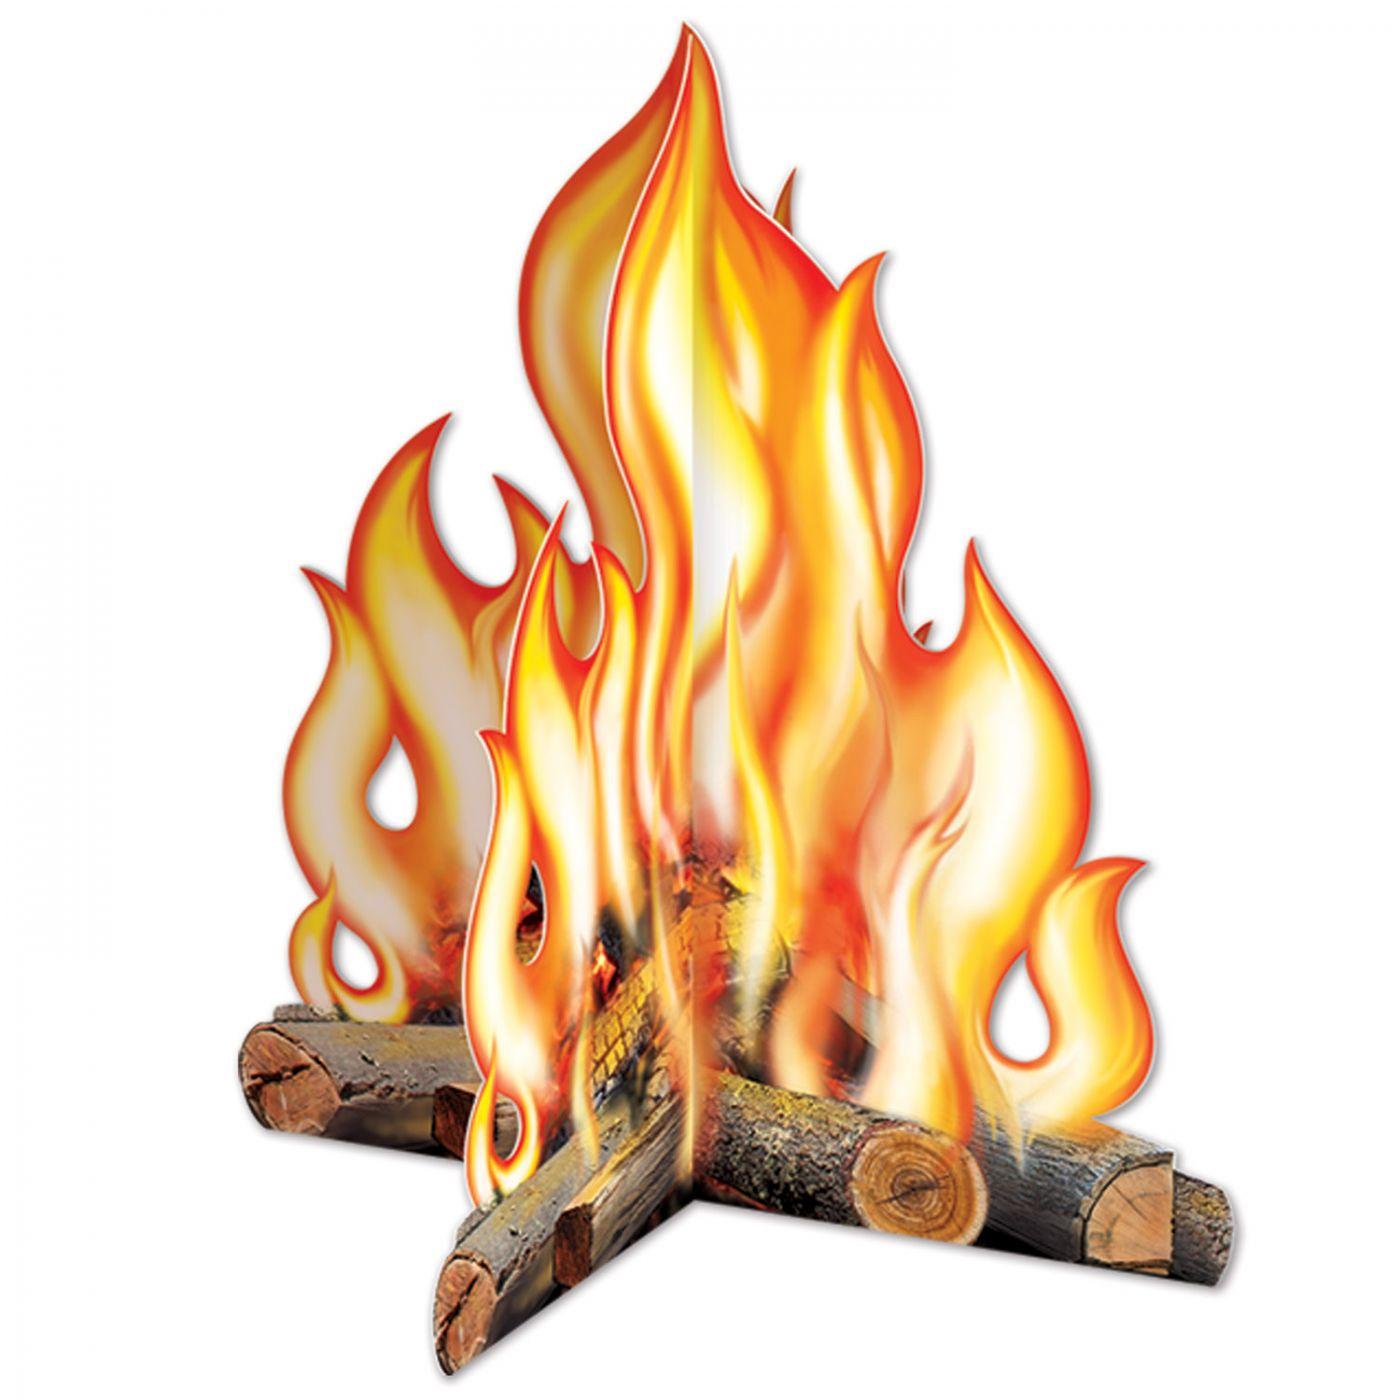 Image of 3-D Campfire Centerpiece